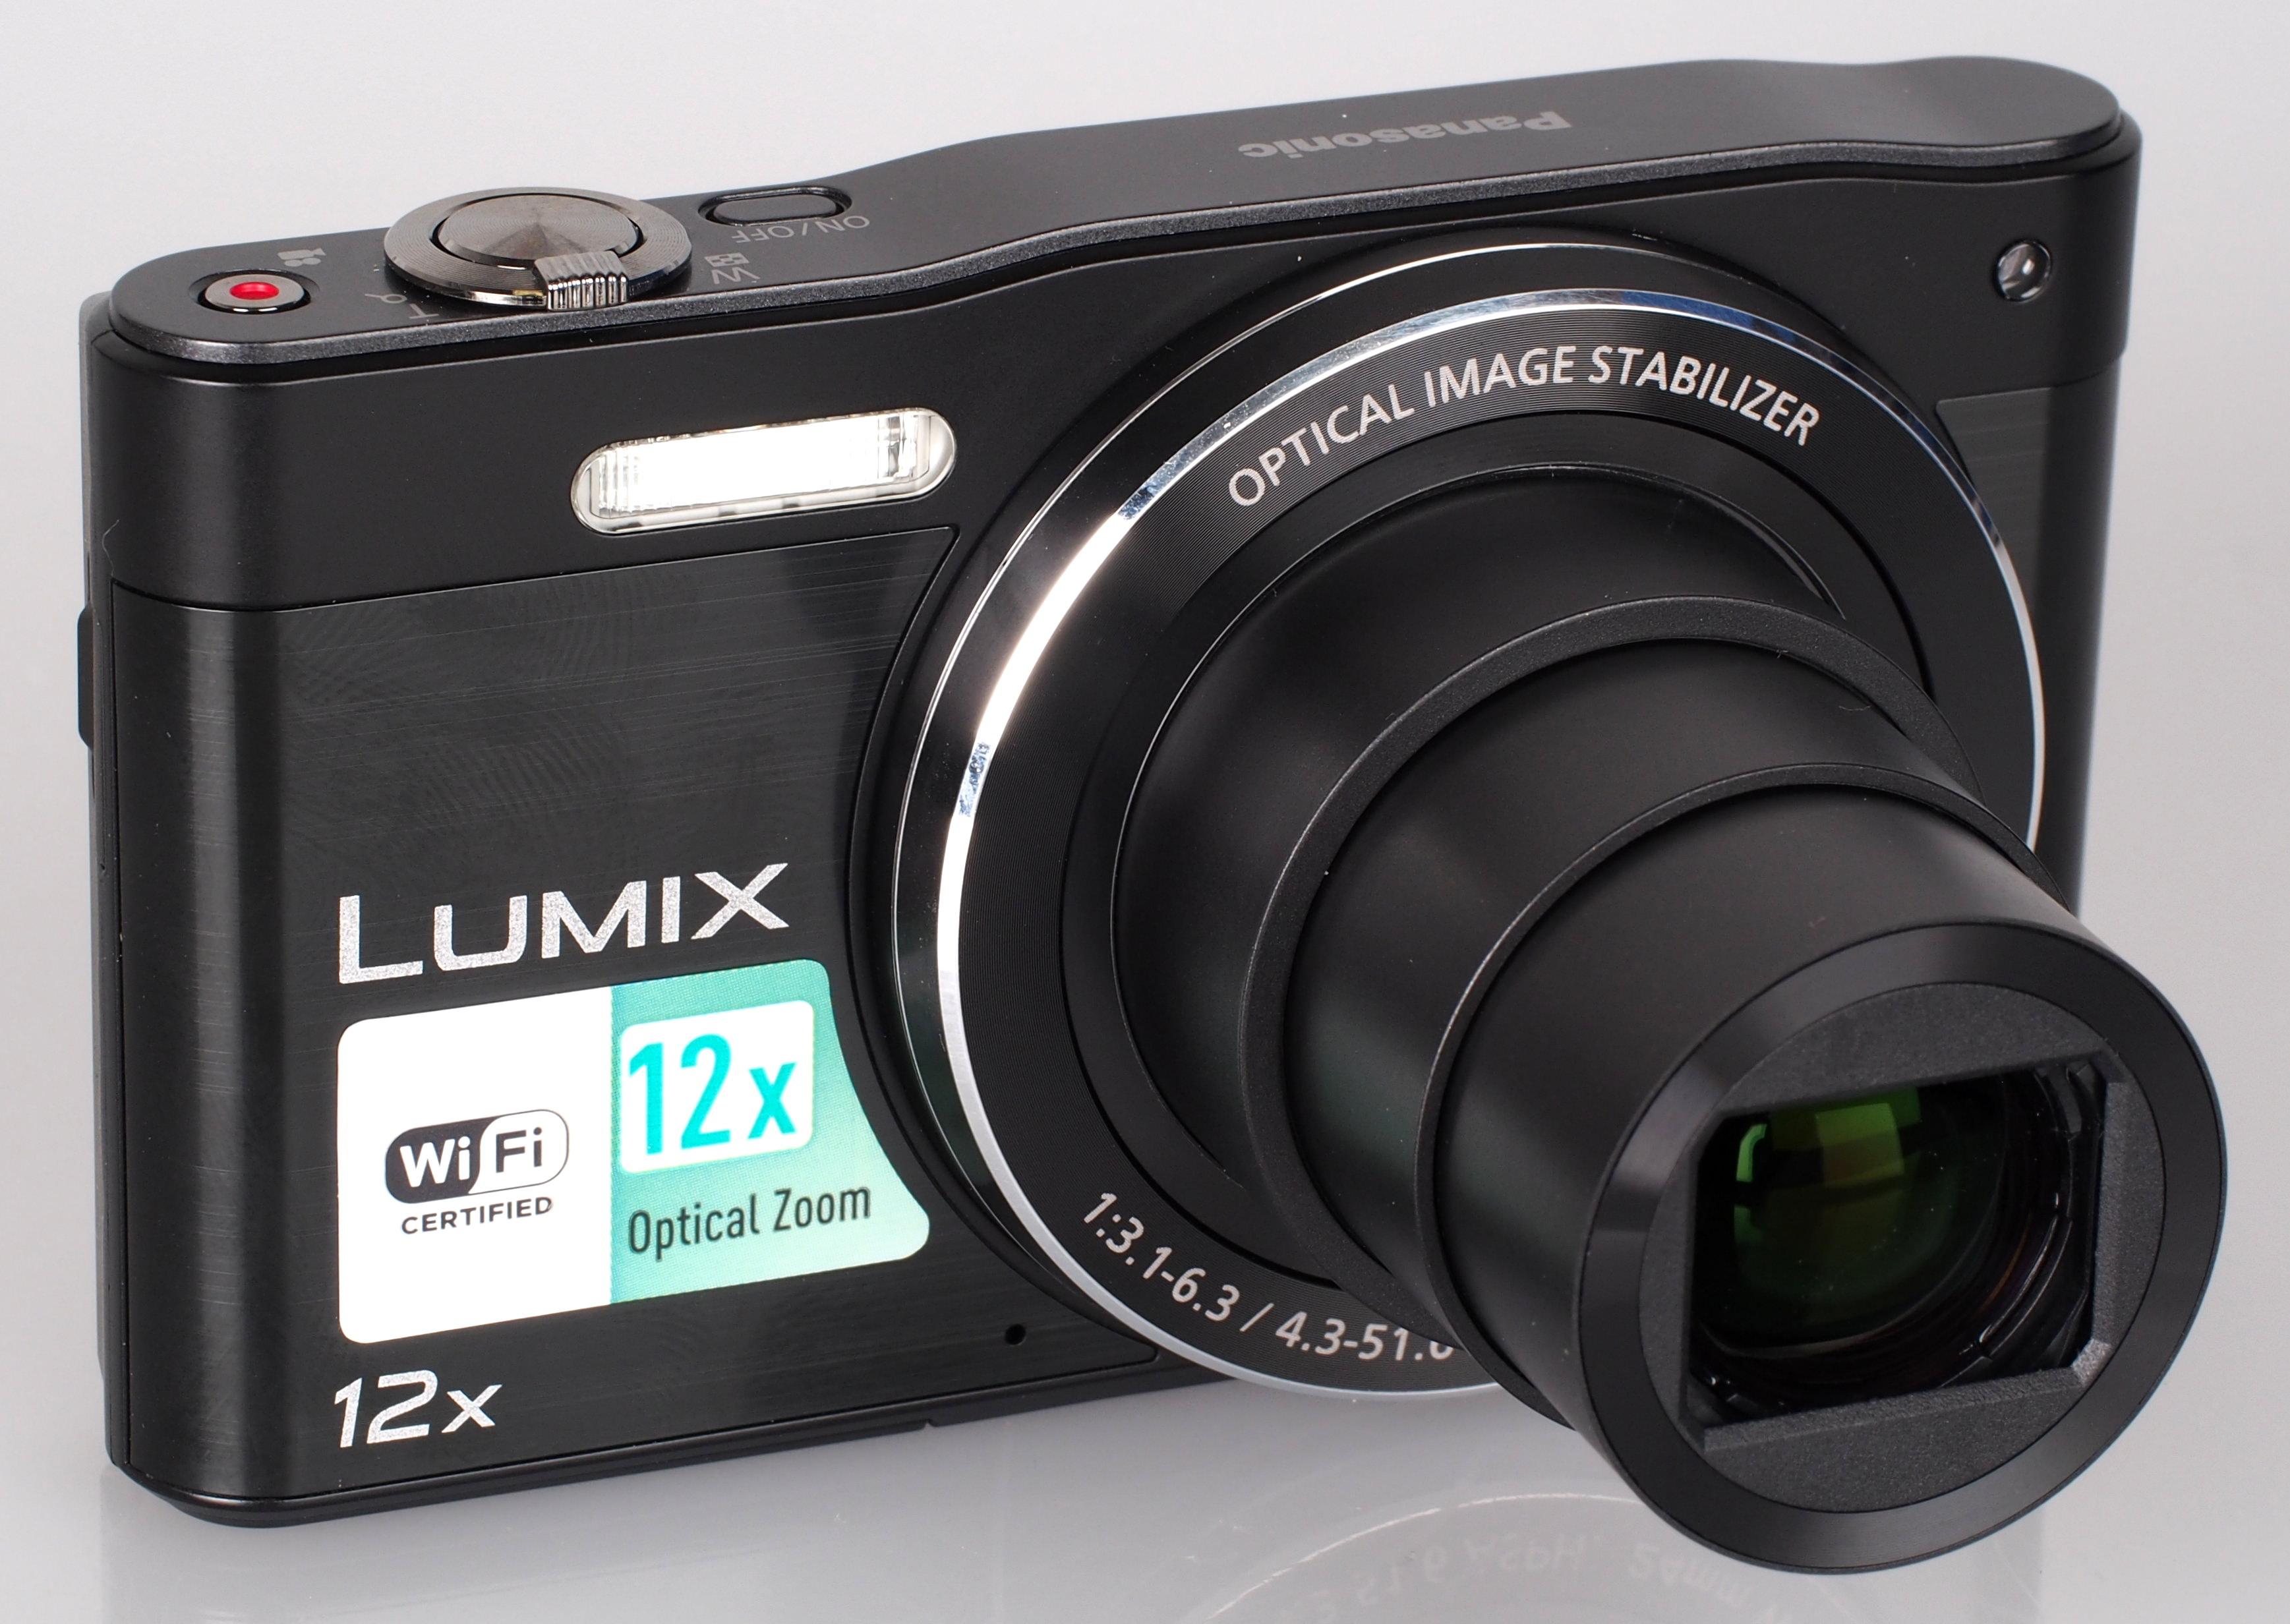 Panasonic Lumix DMC-SZ8 Review   ePHOTOzine